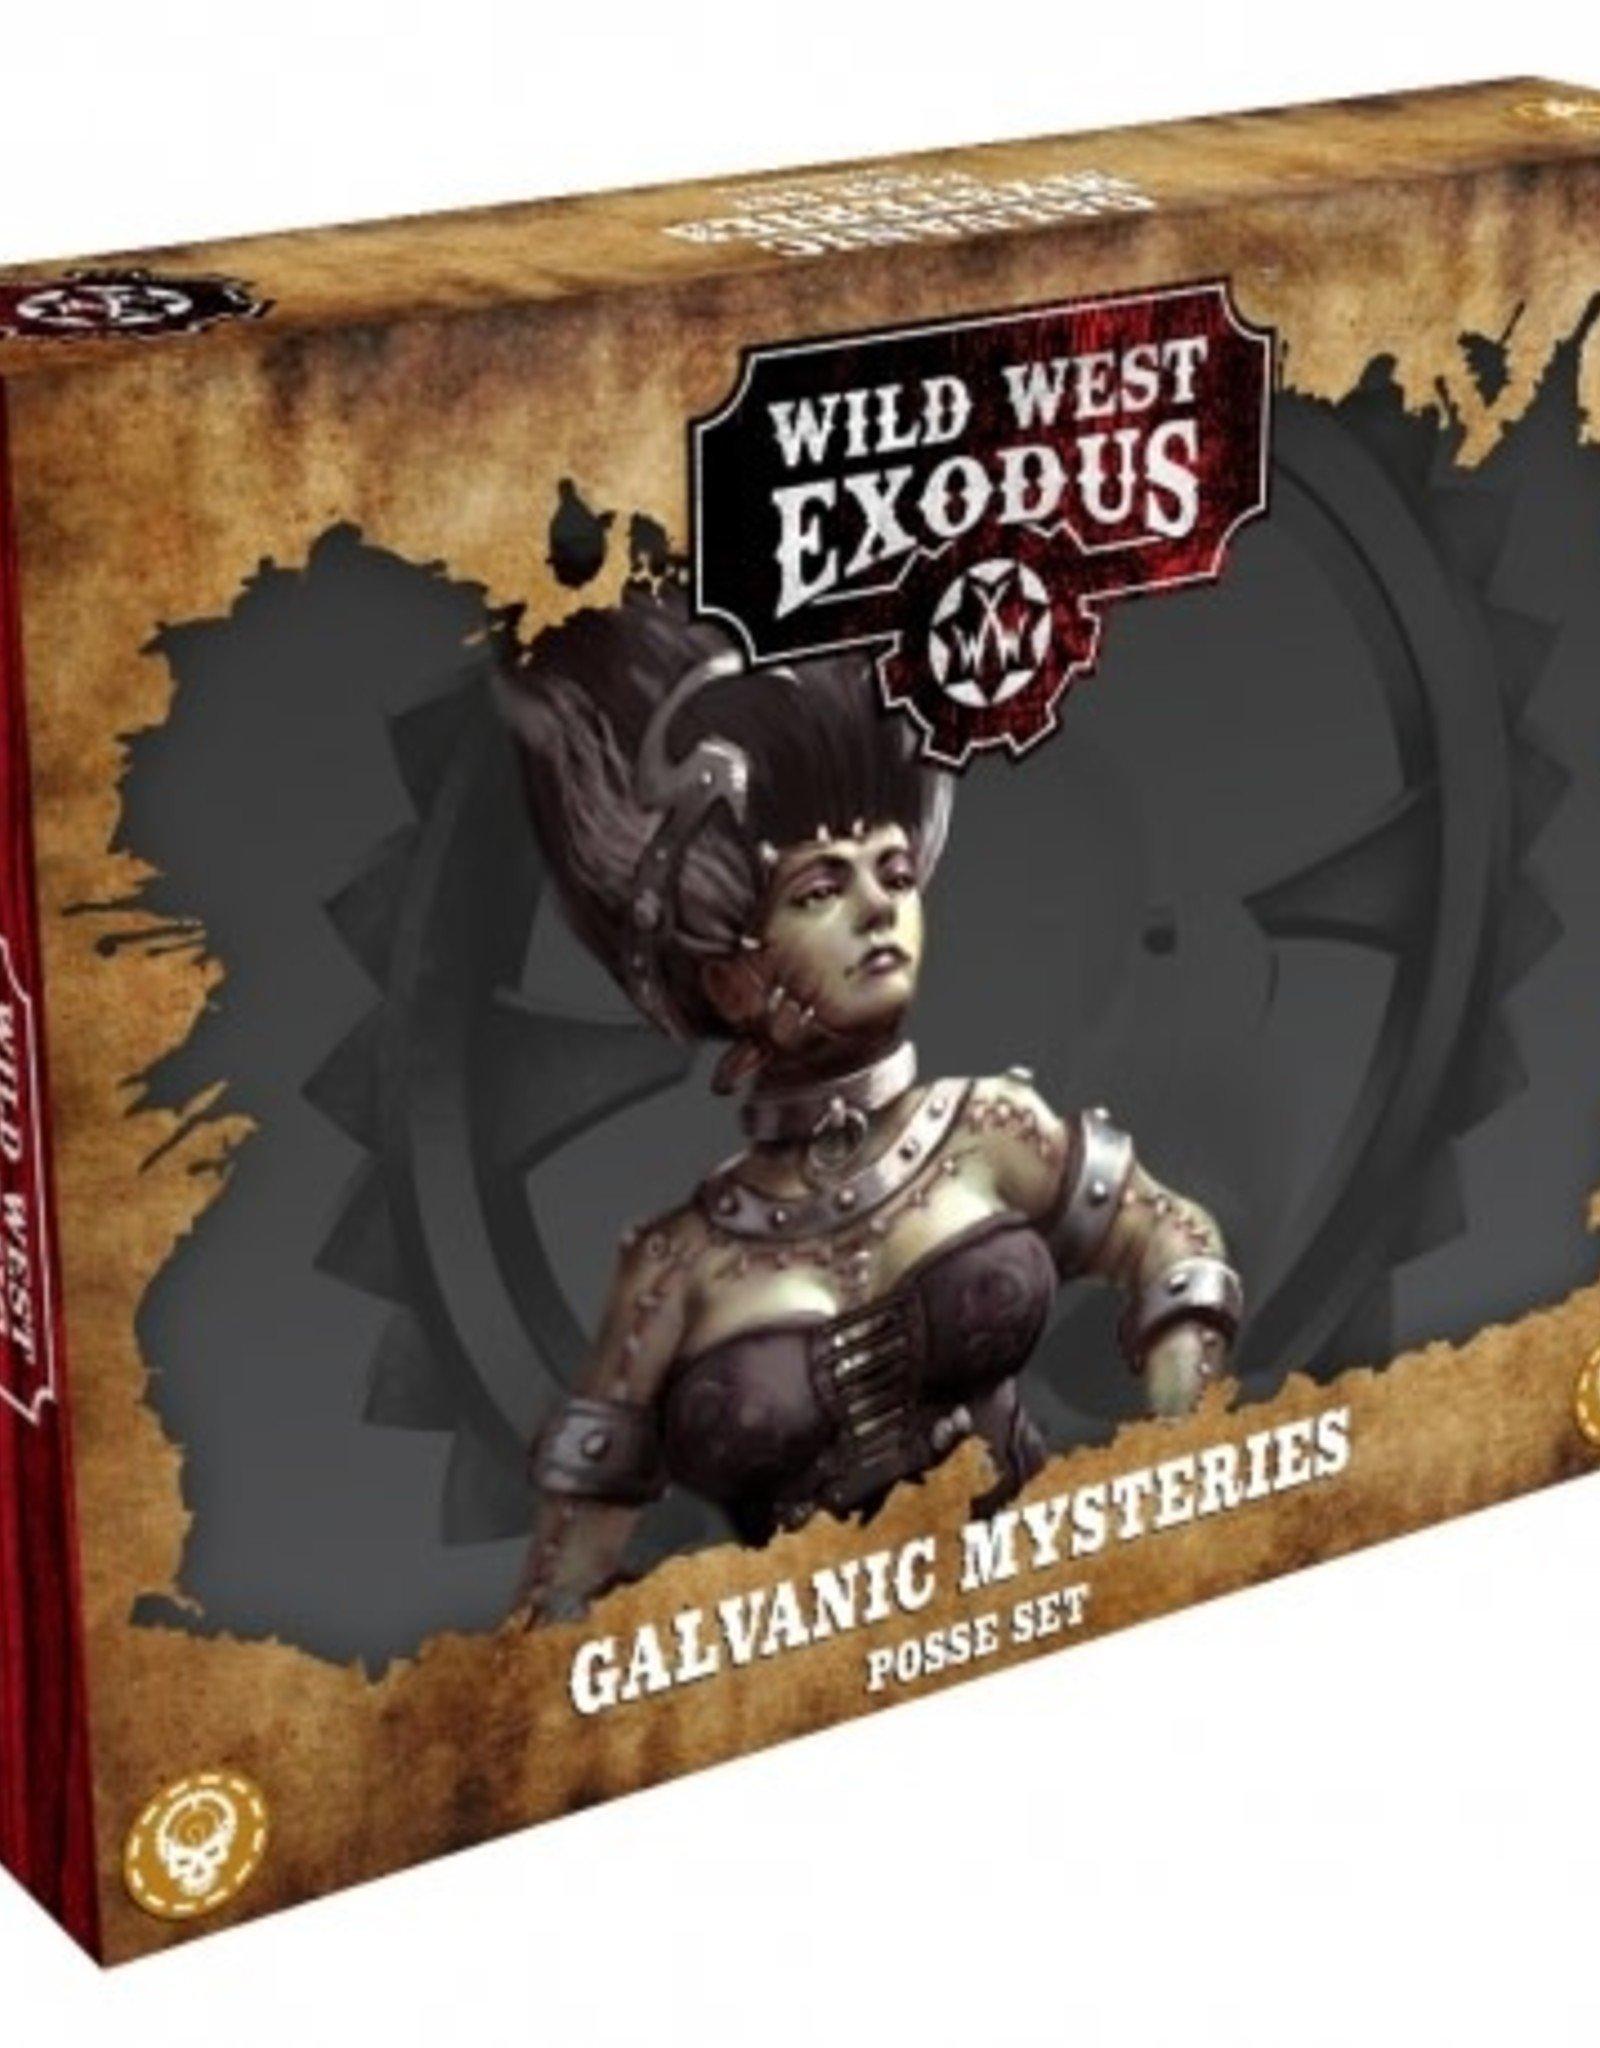 Warcradle Galvanic Mysteries Posse Box